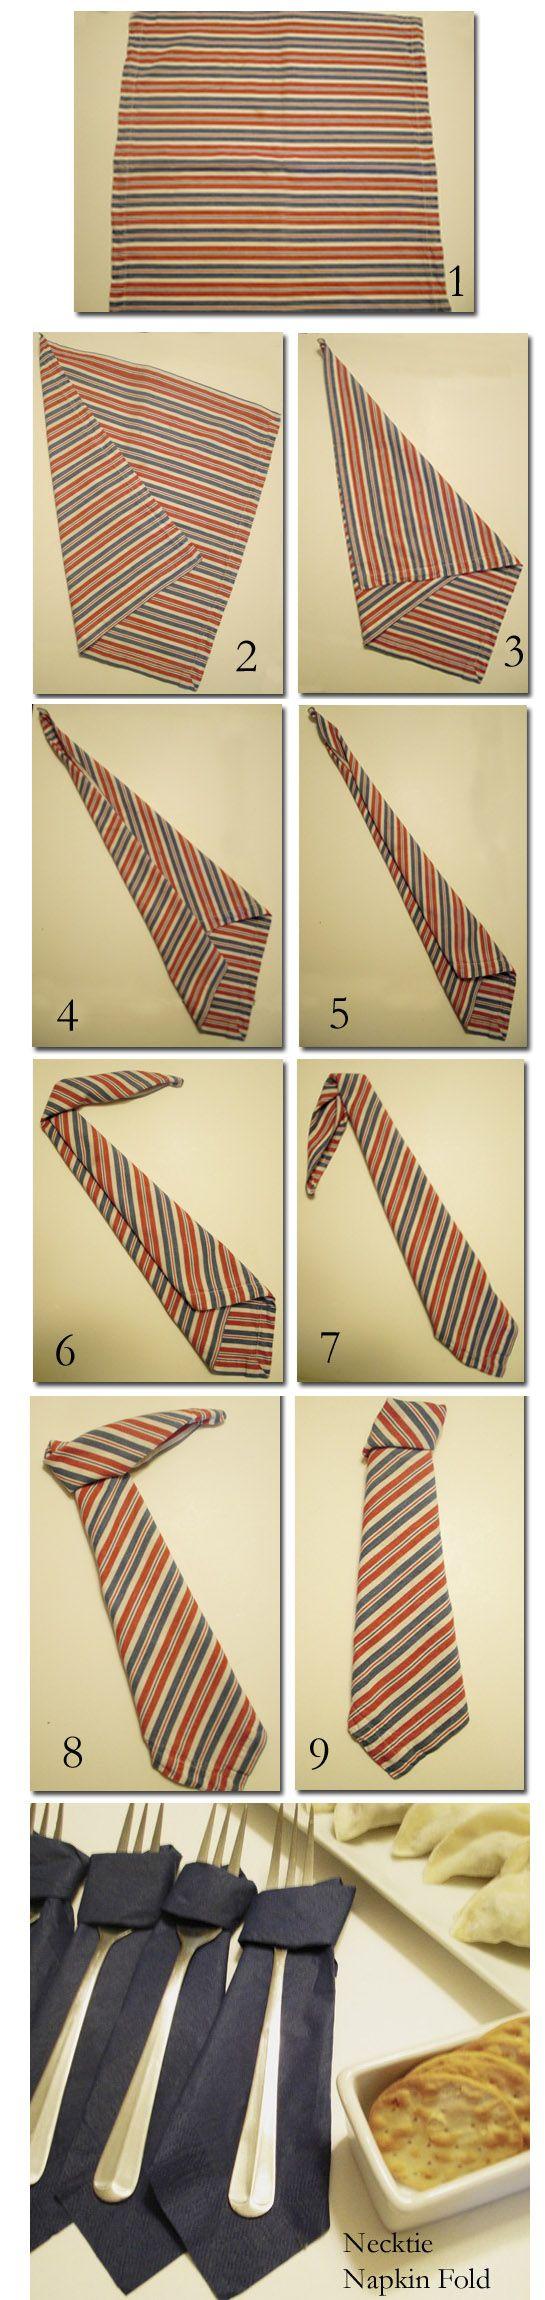 Modern Ways To Fold Napkins Necktie Napkin Fold